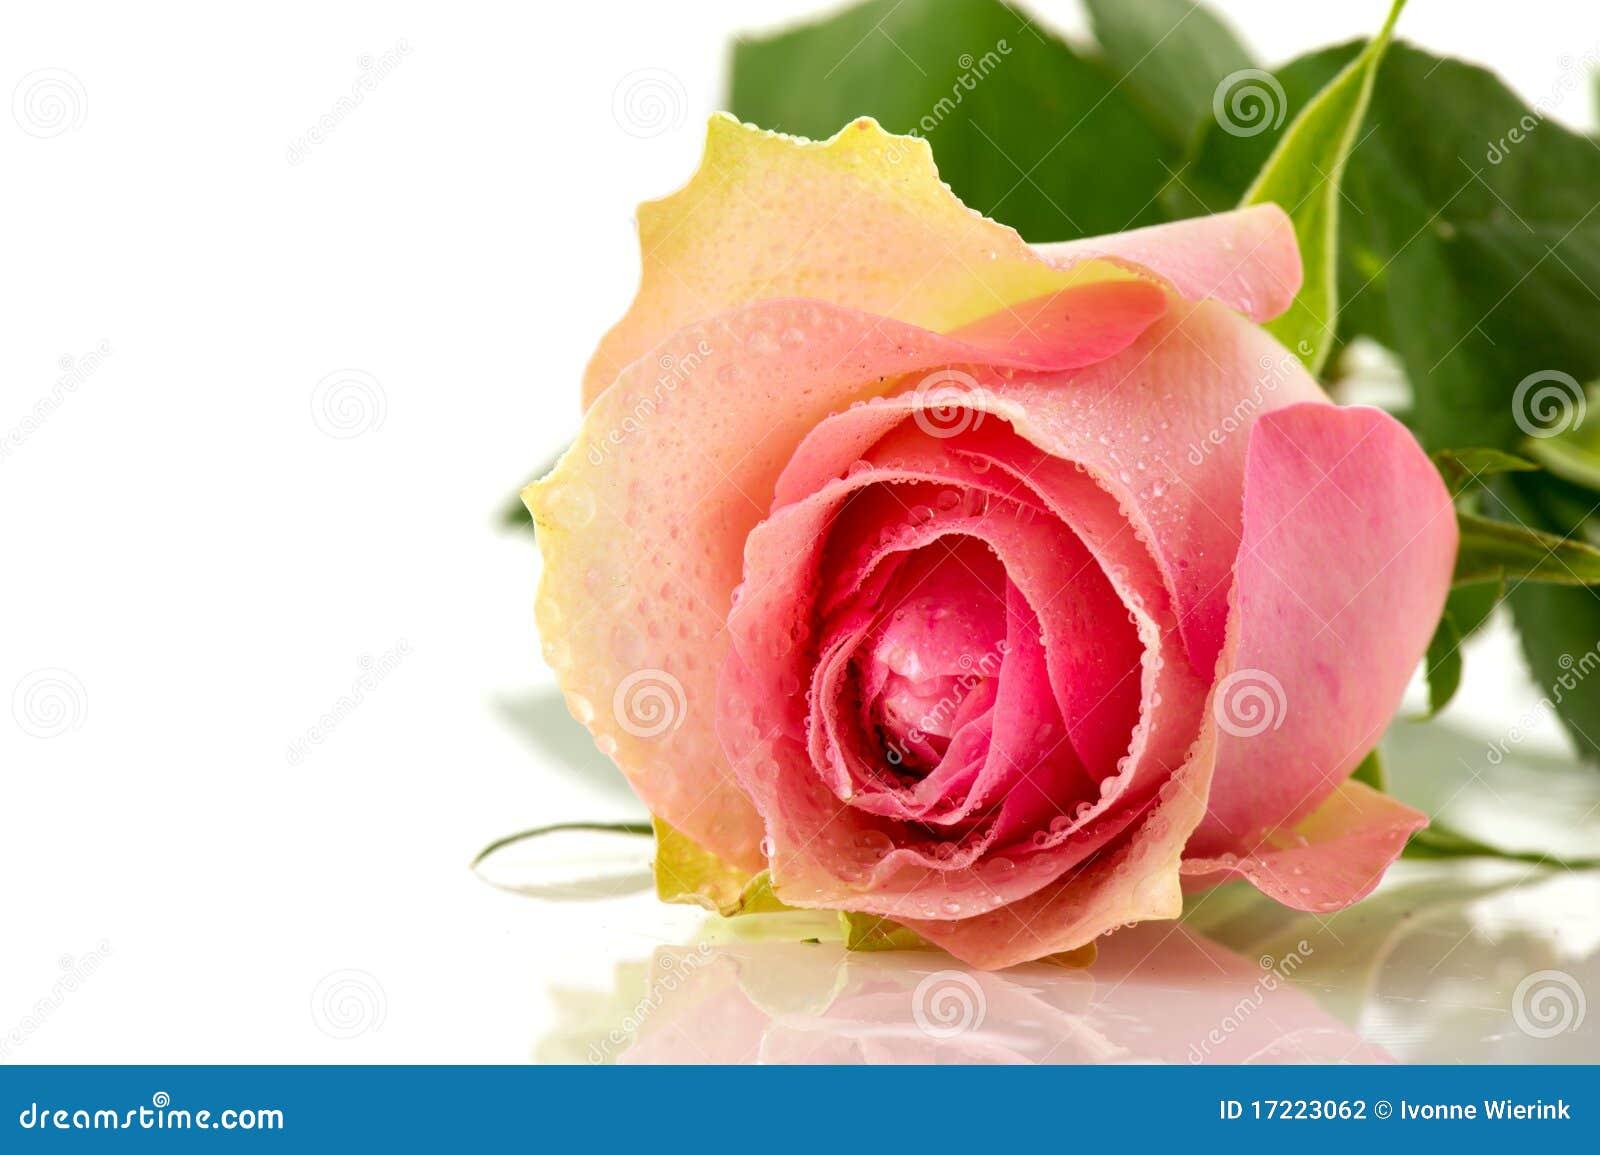 single pink flower rose - photo #46